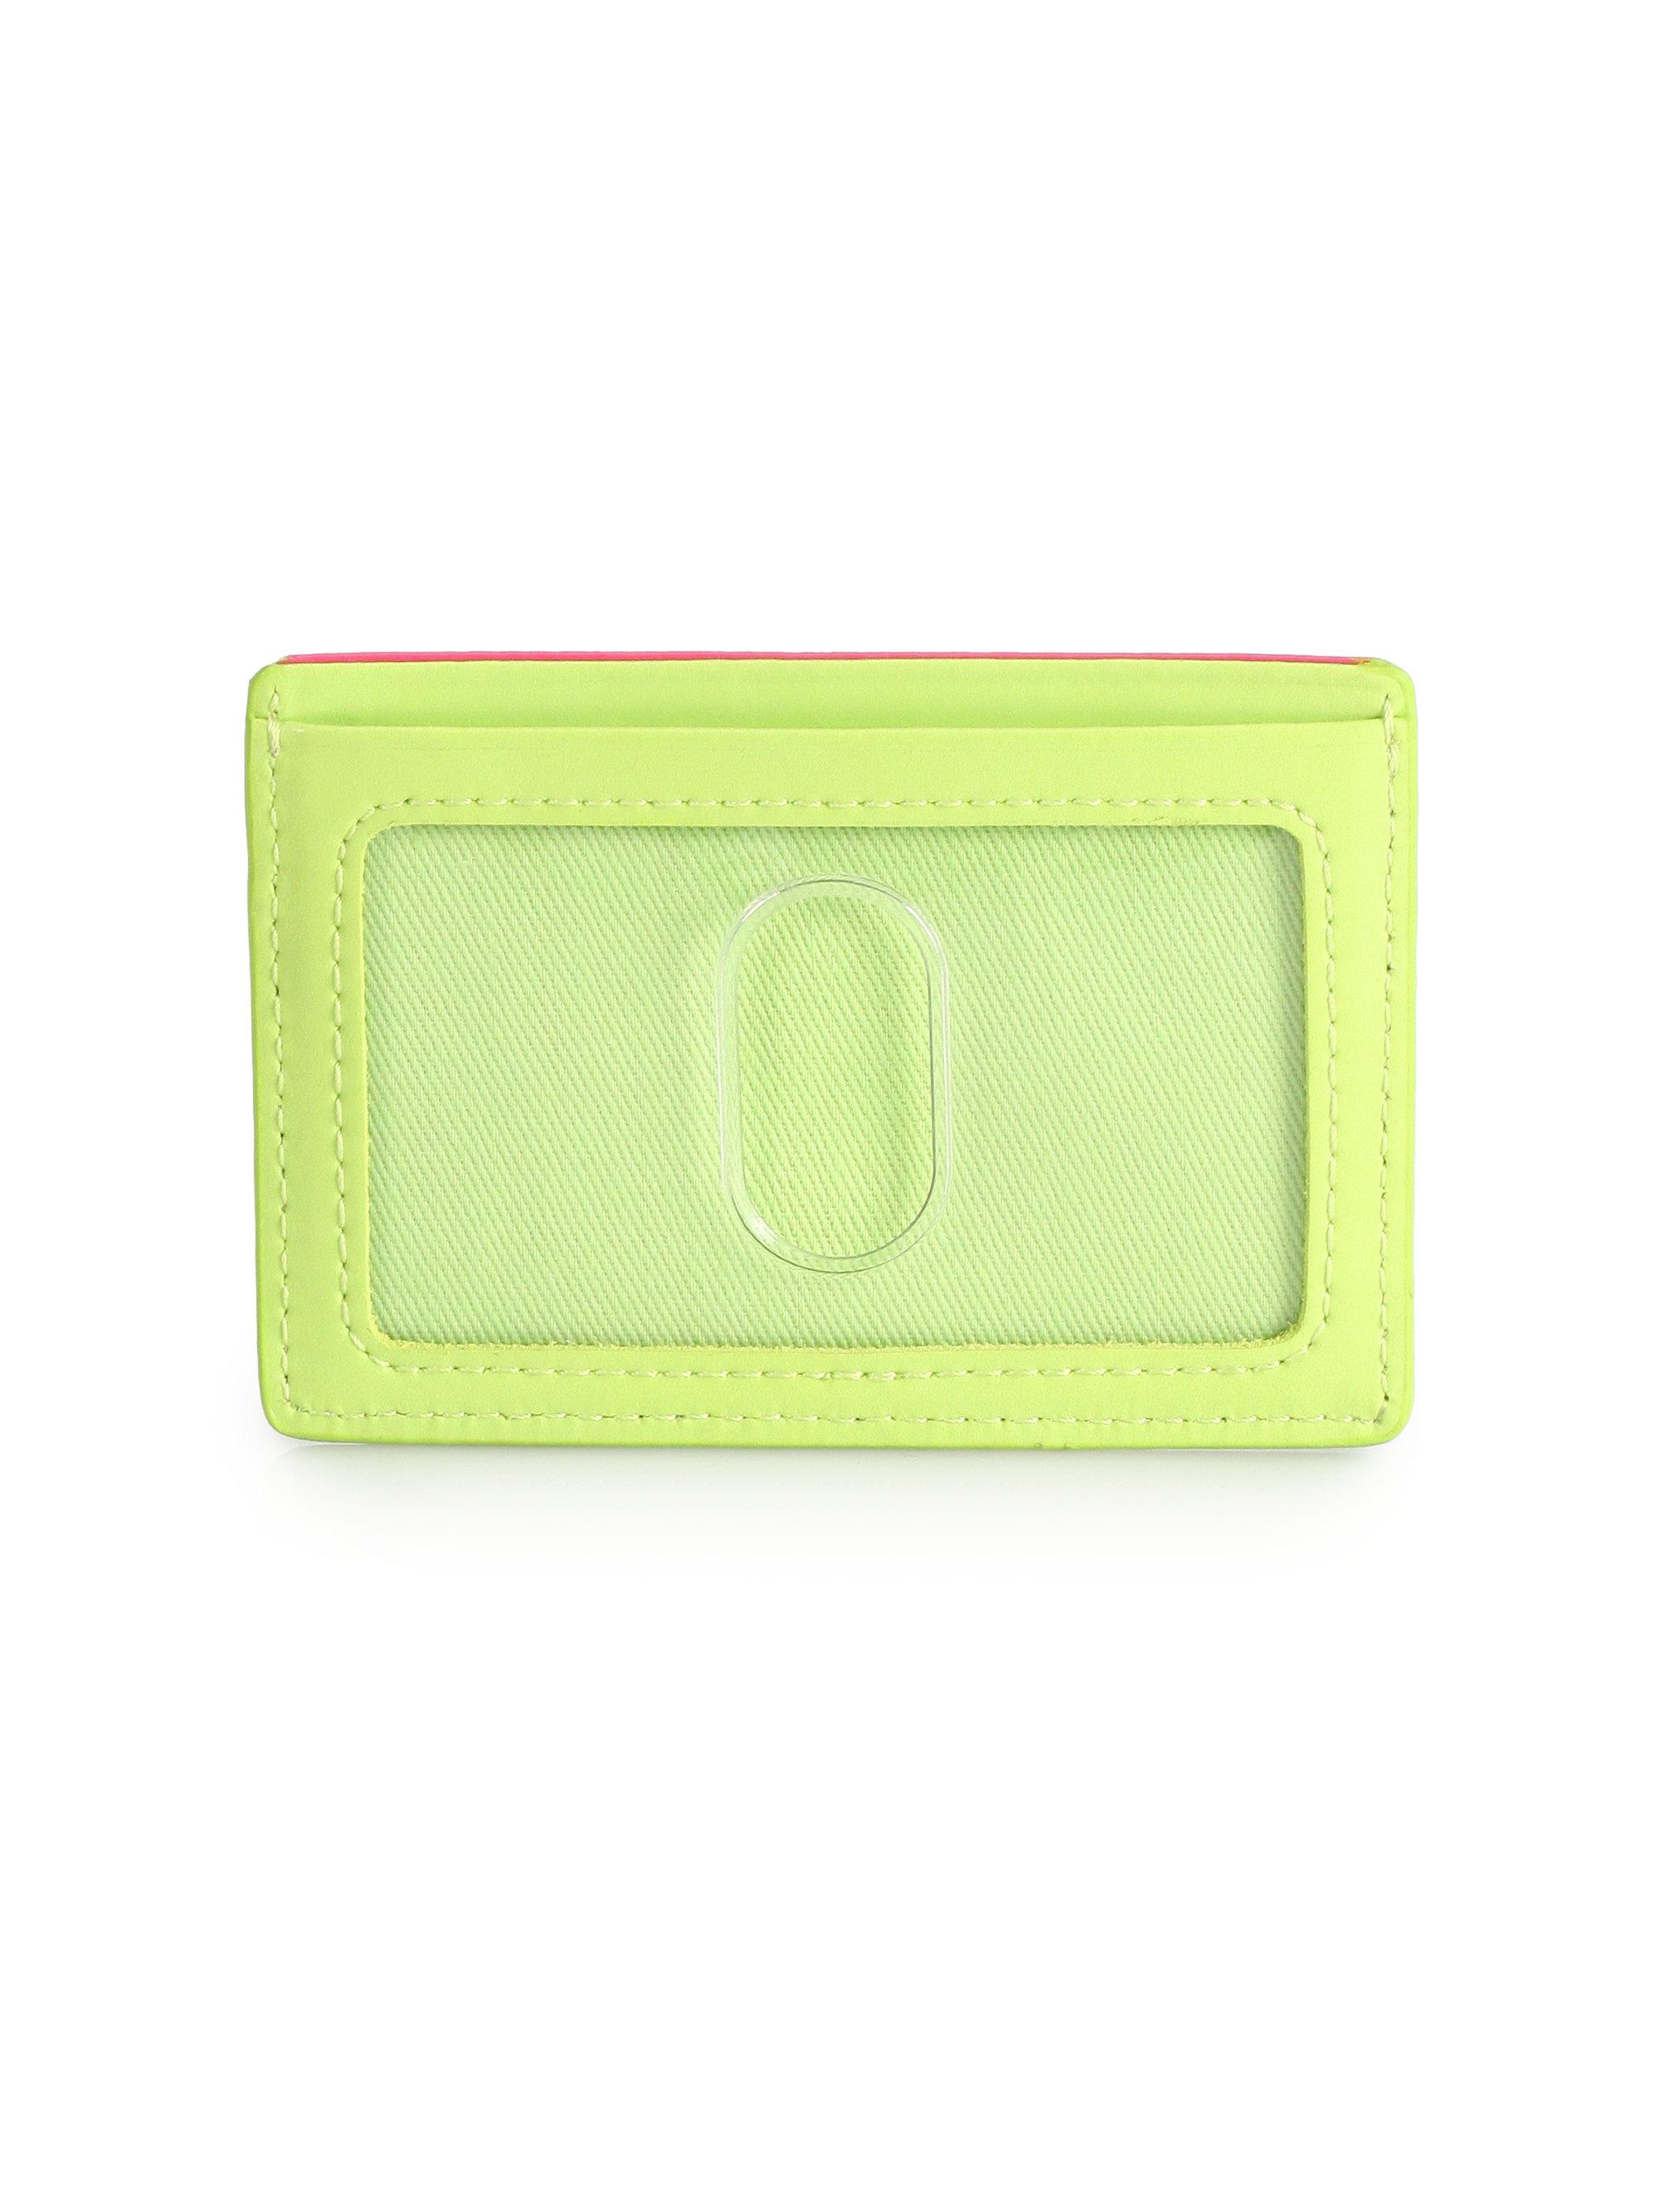 Designer Card Holder With Id Window Women S